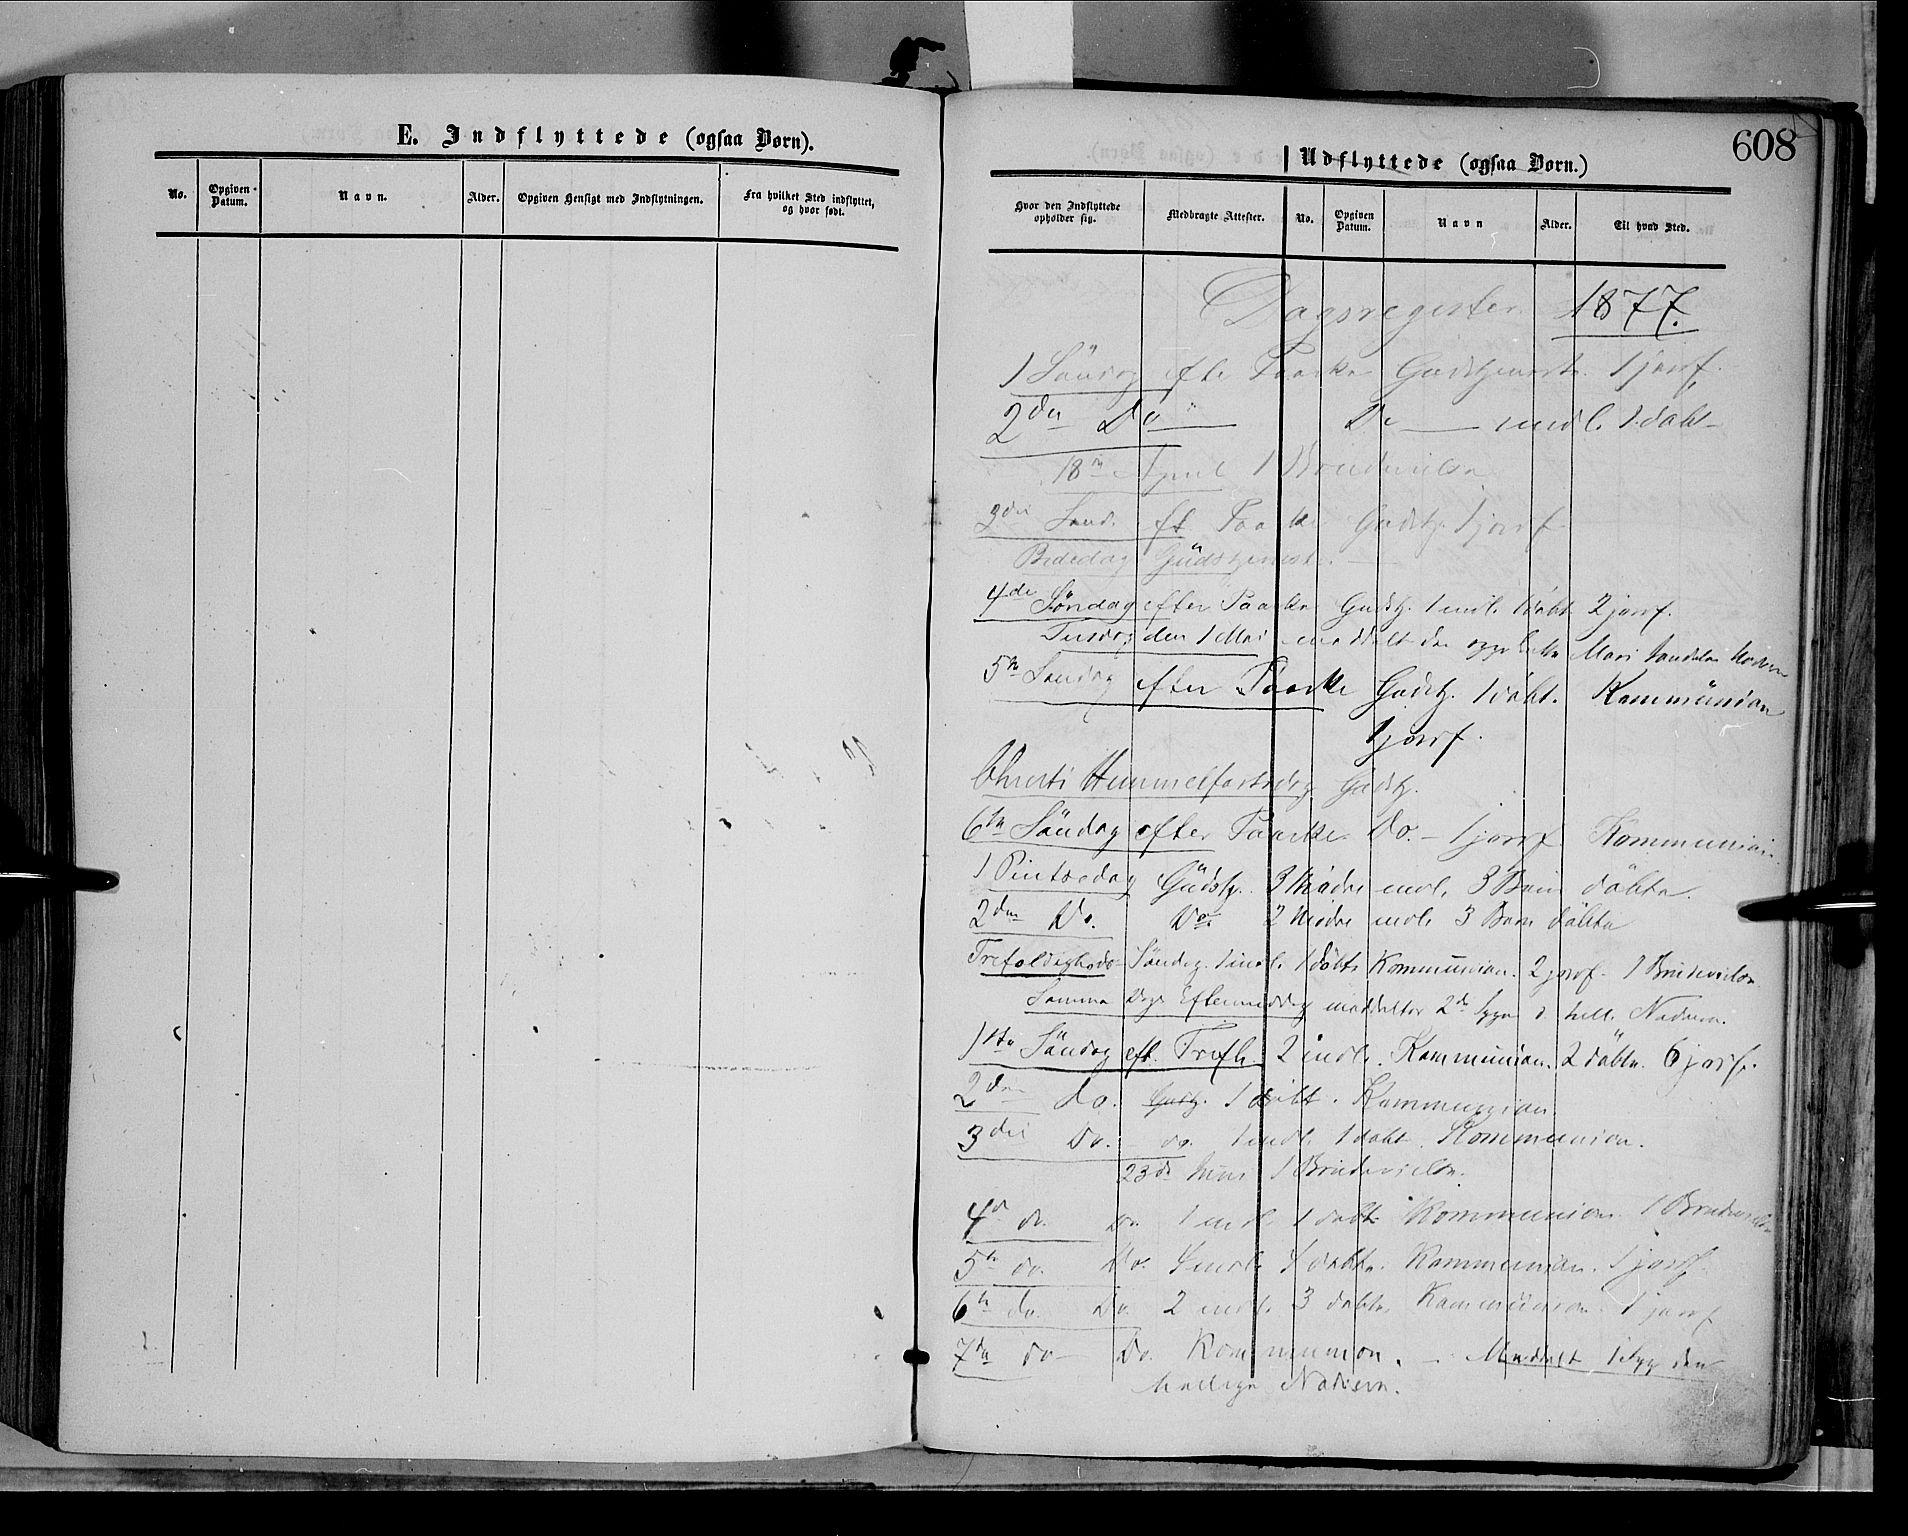 SAH, Dovre prestekontor, Ministerialbok nr. 1, 1854-1878, s. 608